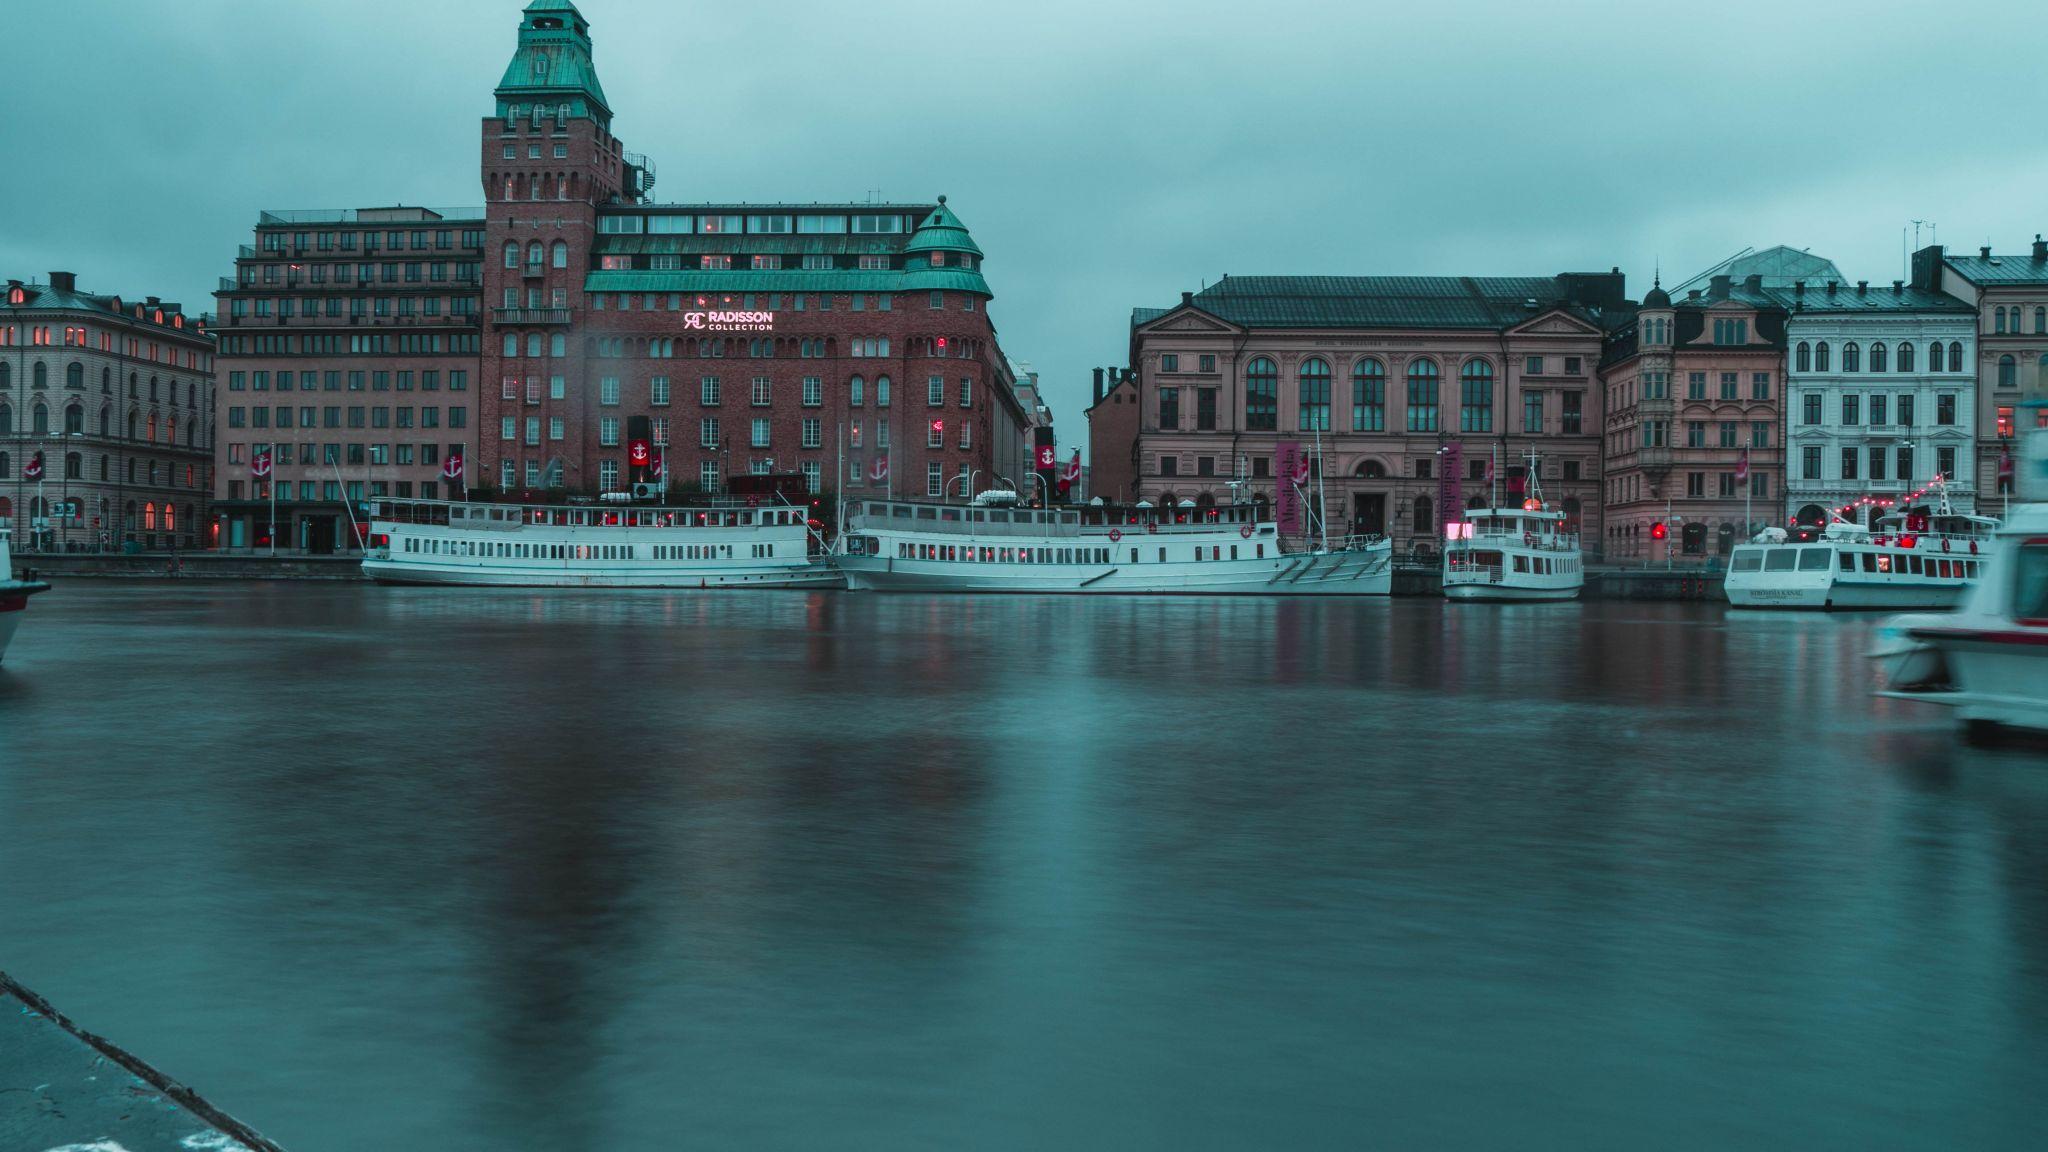 Radisson Hotel over Water, Sweden